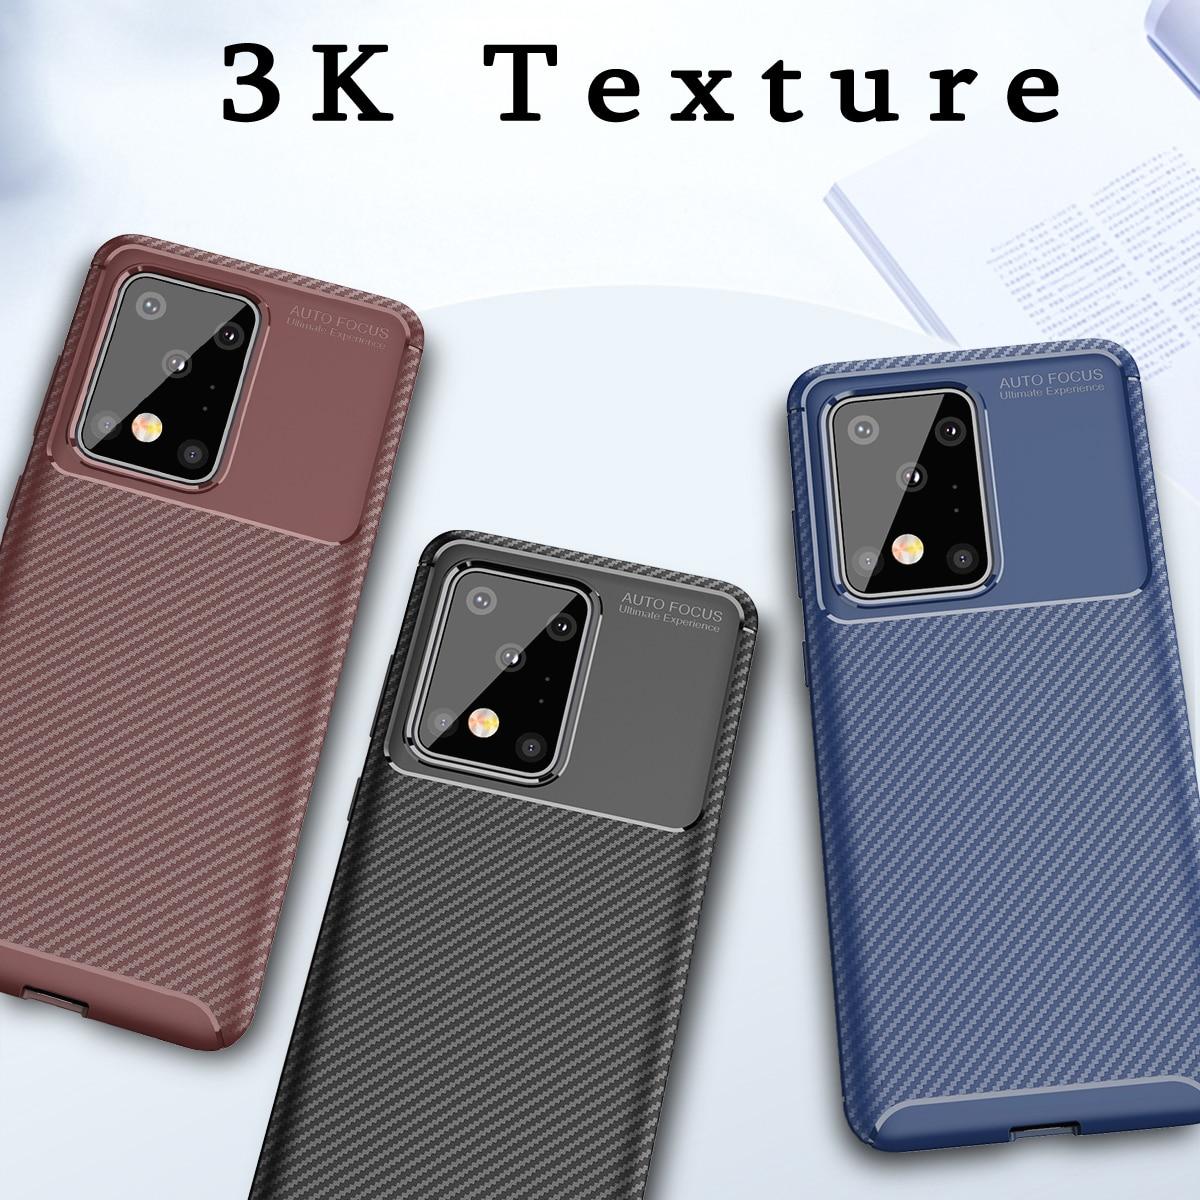 Чехол HATOLY для Samsung S20, Ультратонкий Мягкий ТПУ чехол-накладка из углеродного волокна для Samsung S20 Ultra S20 S20 + ^